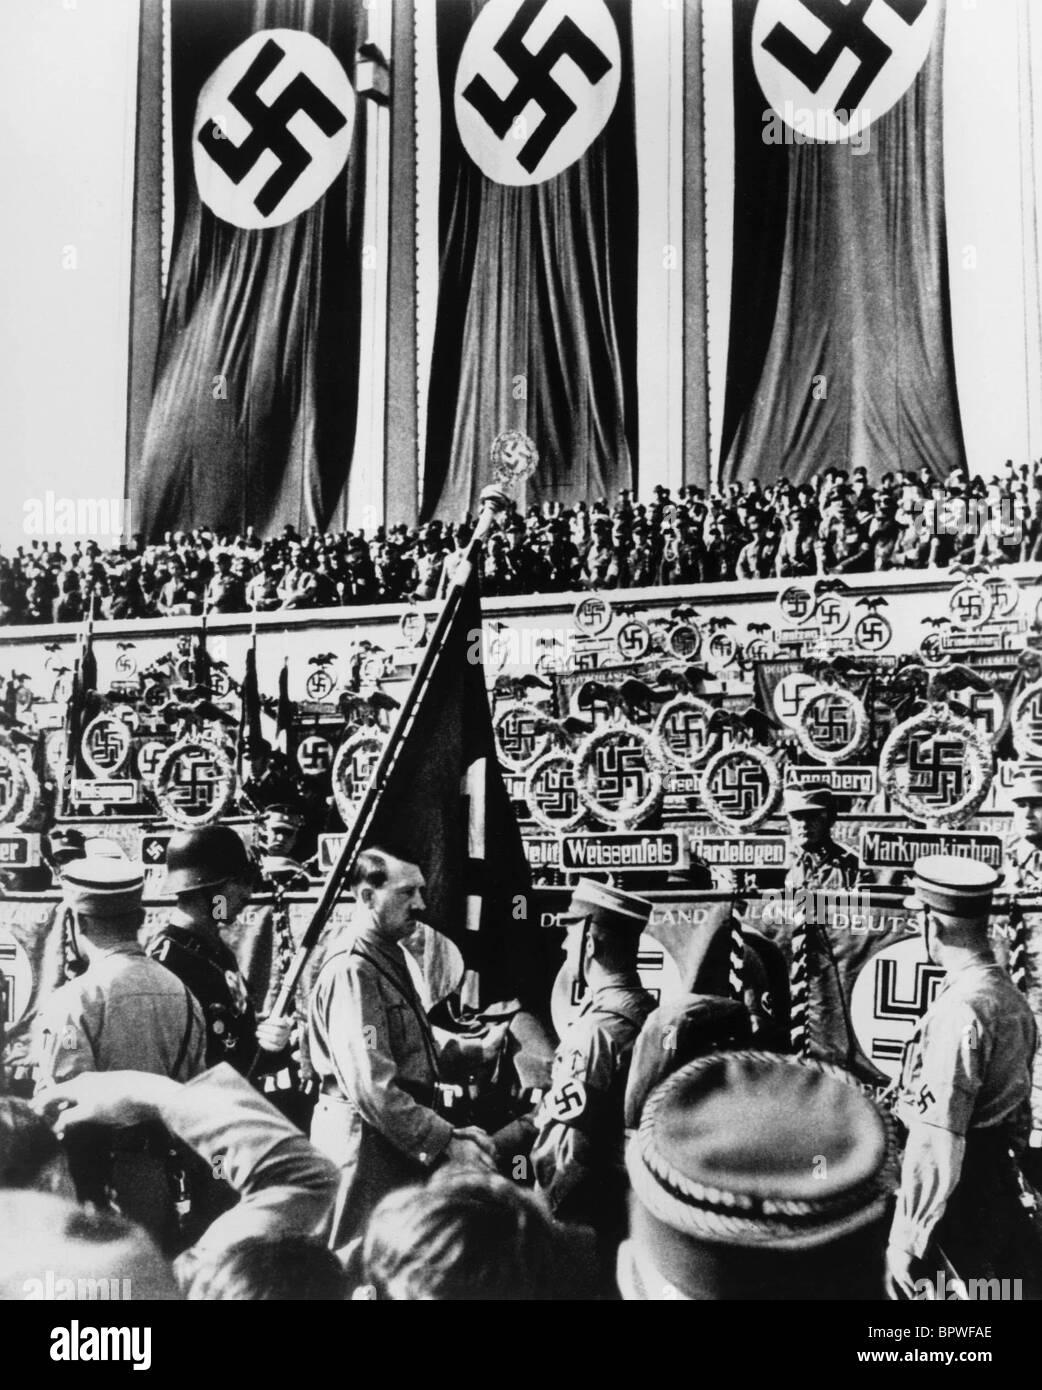 ADOLF HITLER NAZI LEADER 01 May 1942 Stock Photo